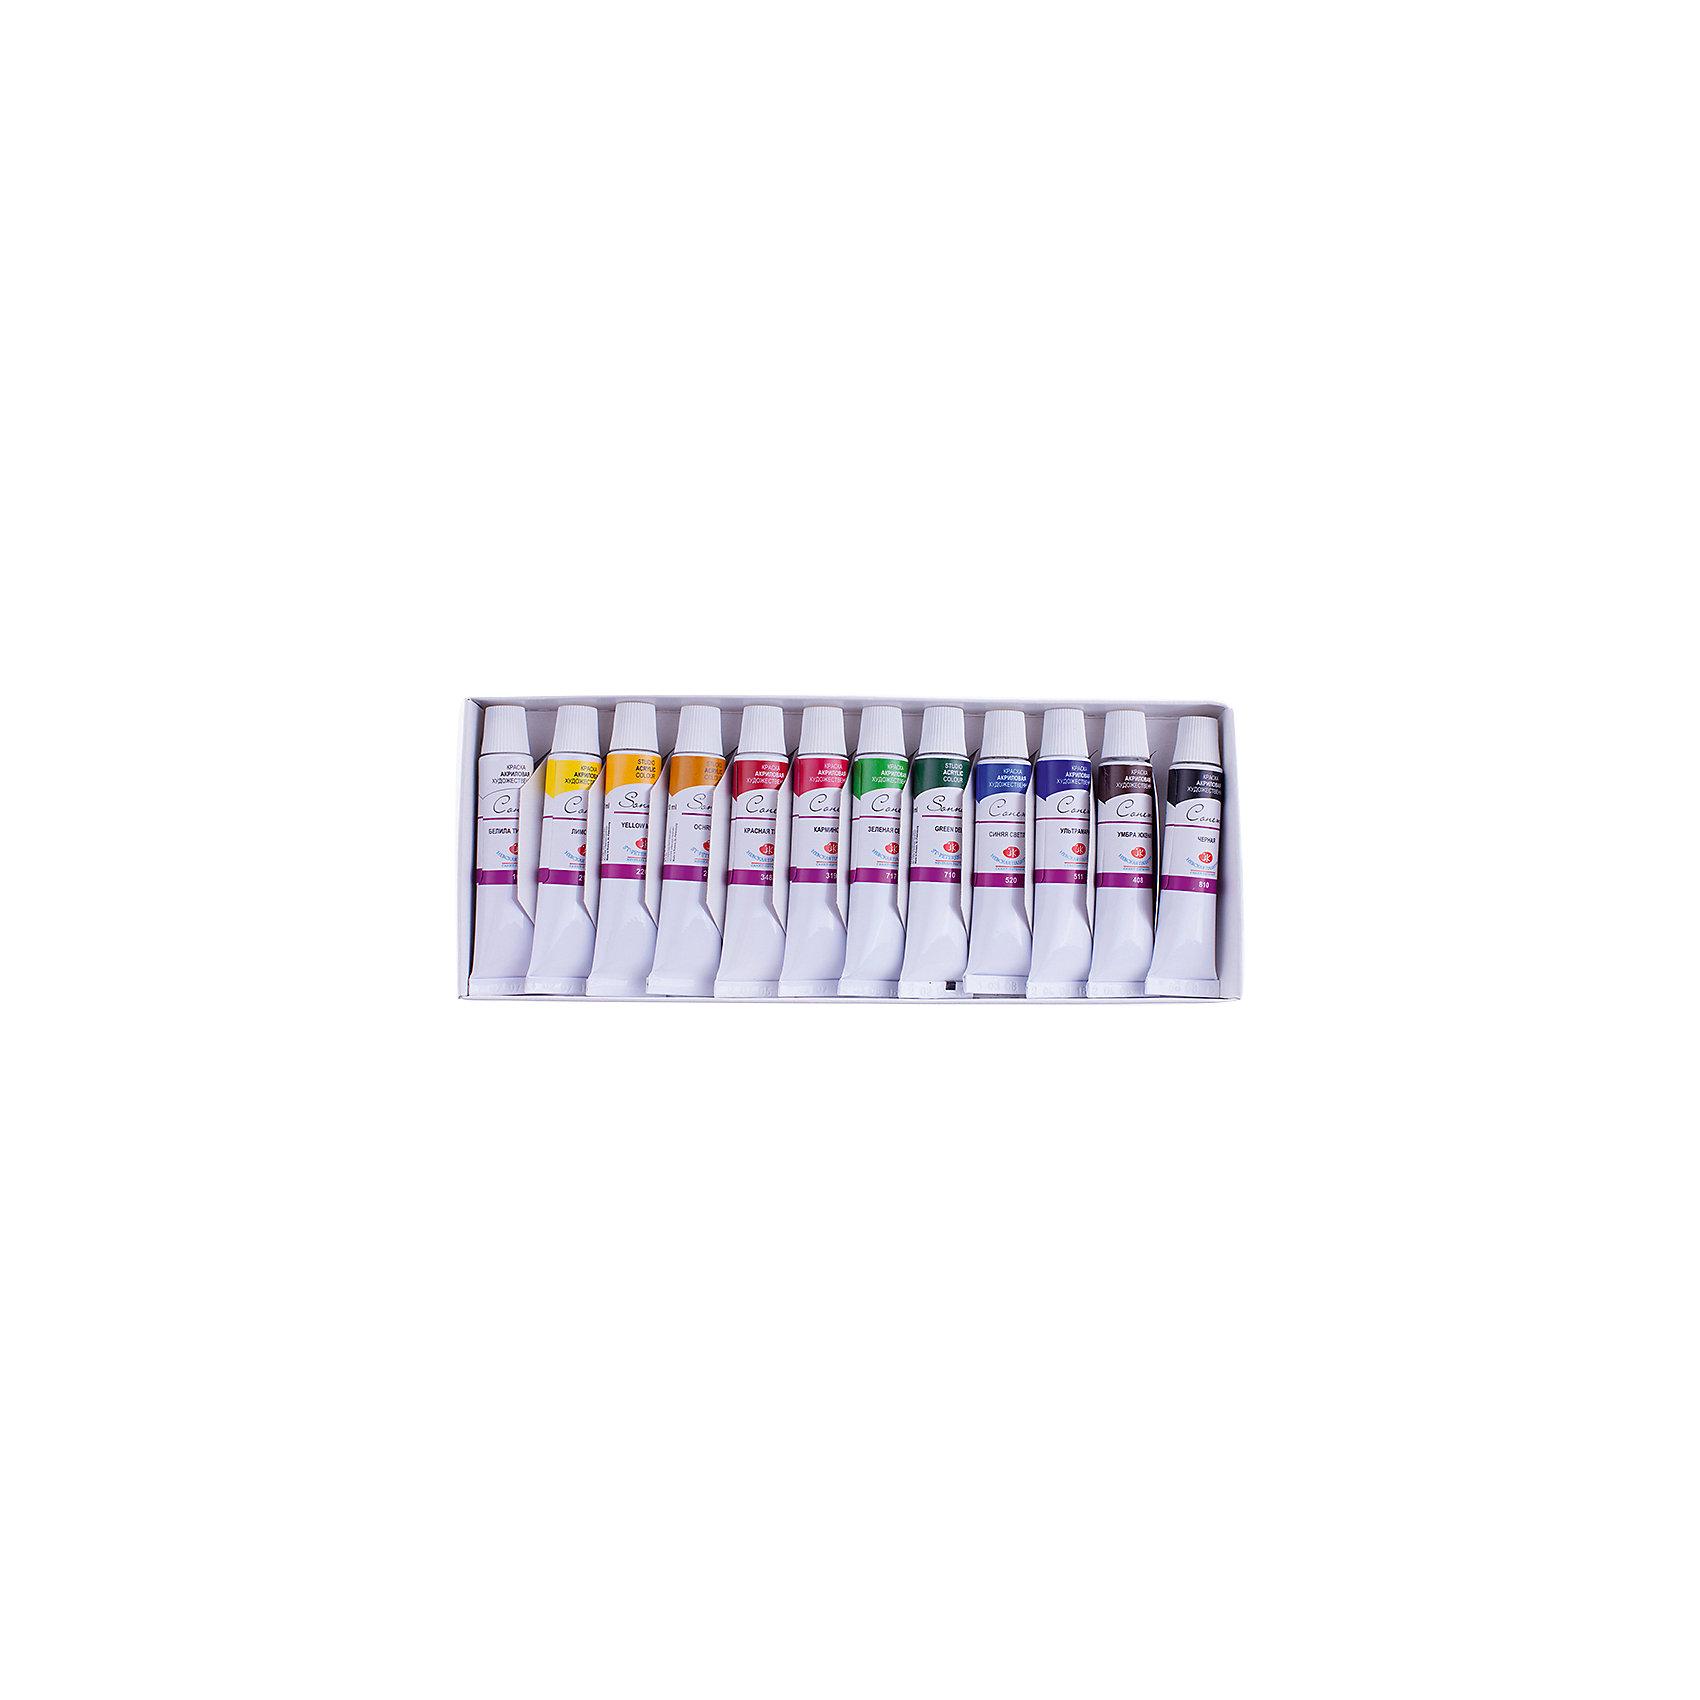 Краски акриловые 12цветов 10мл/туба Сонет от myToys